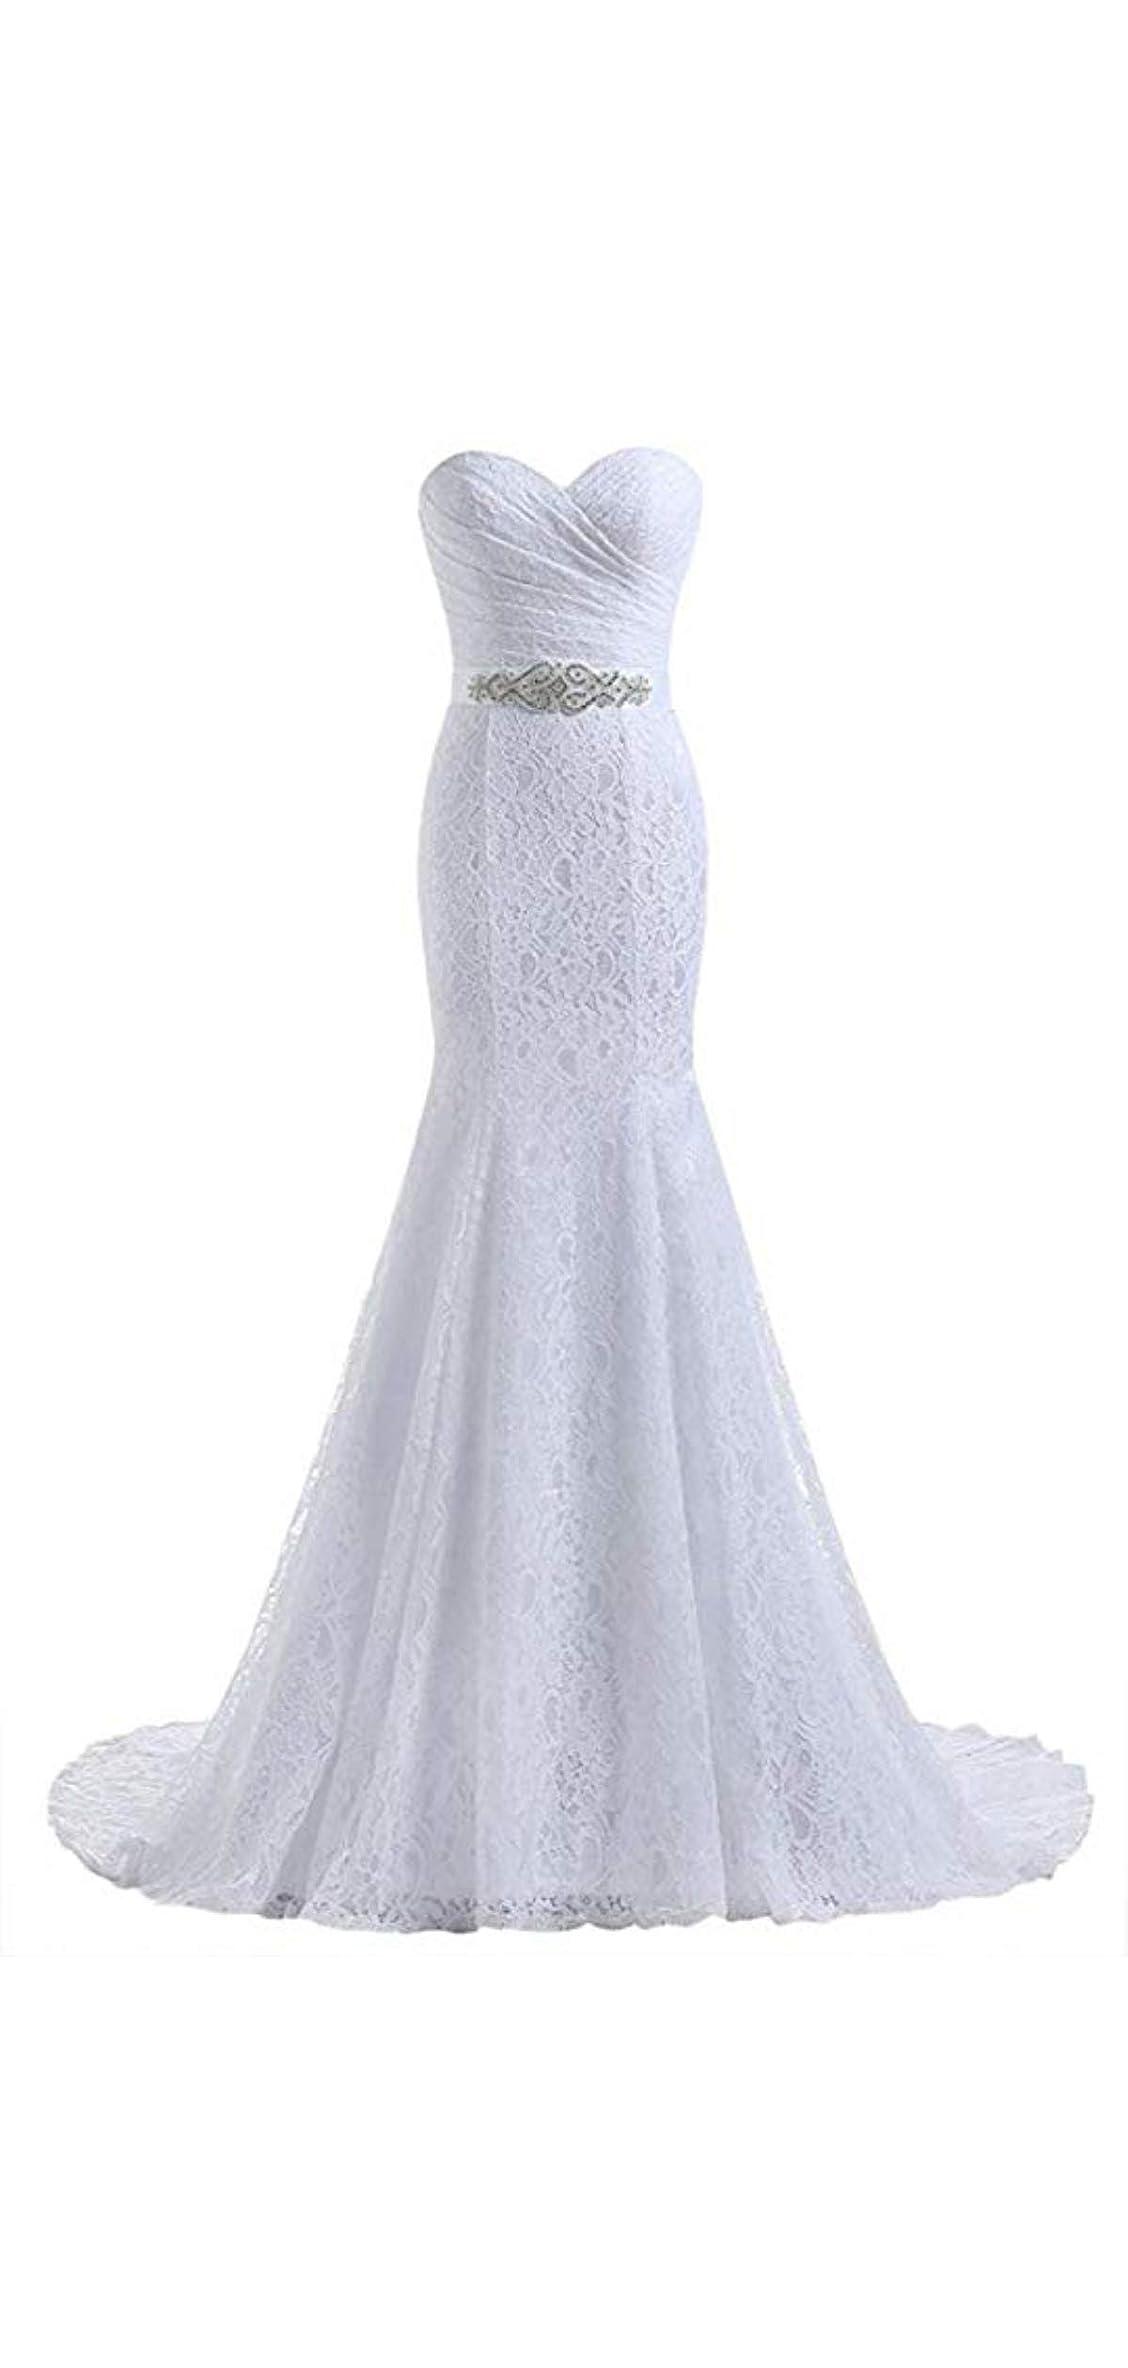 Women's Lace Mermaid Bridal Wedding Dresses